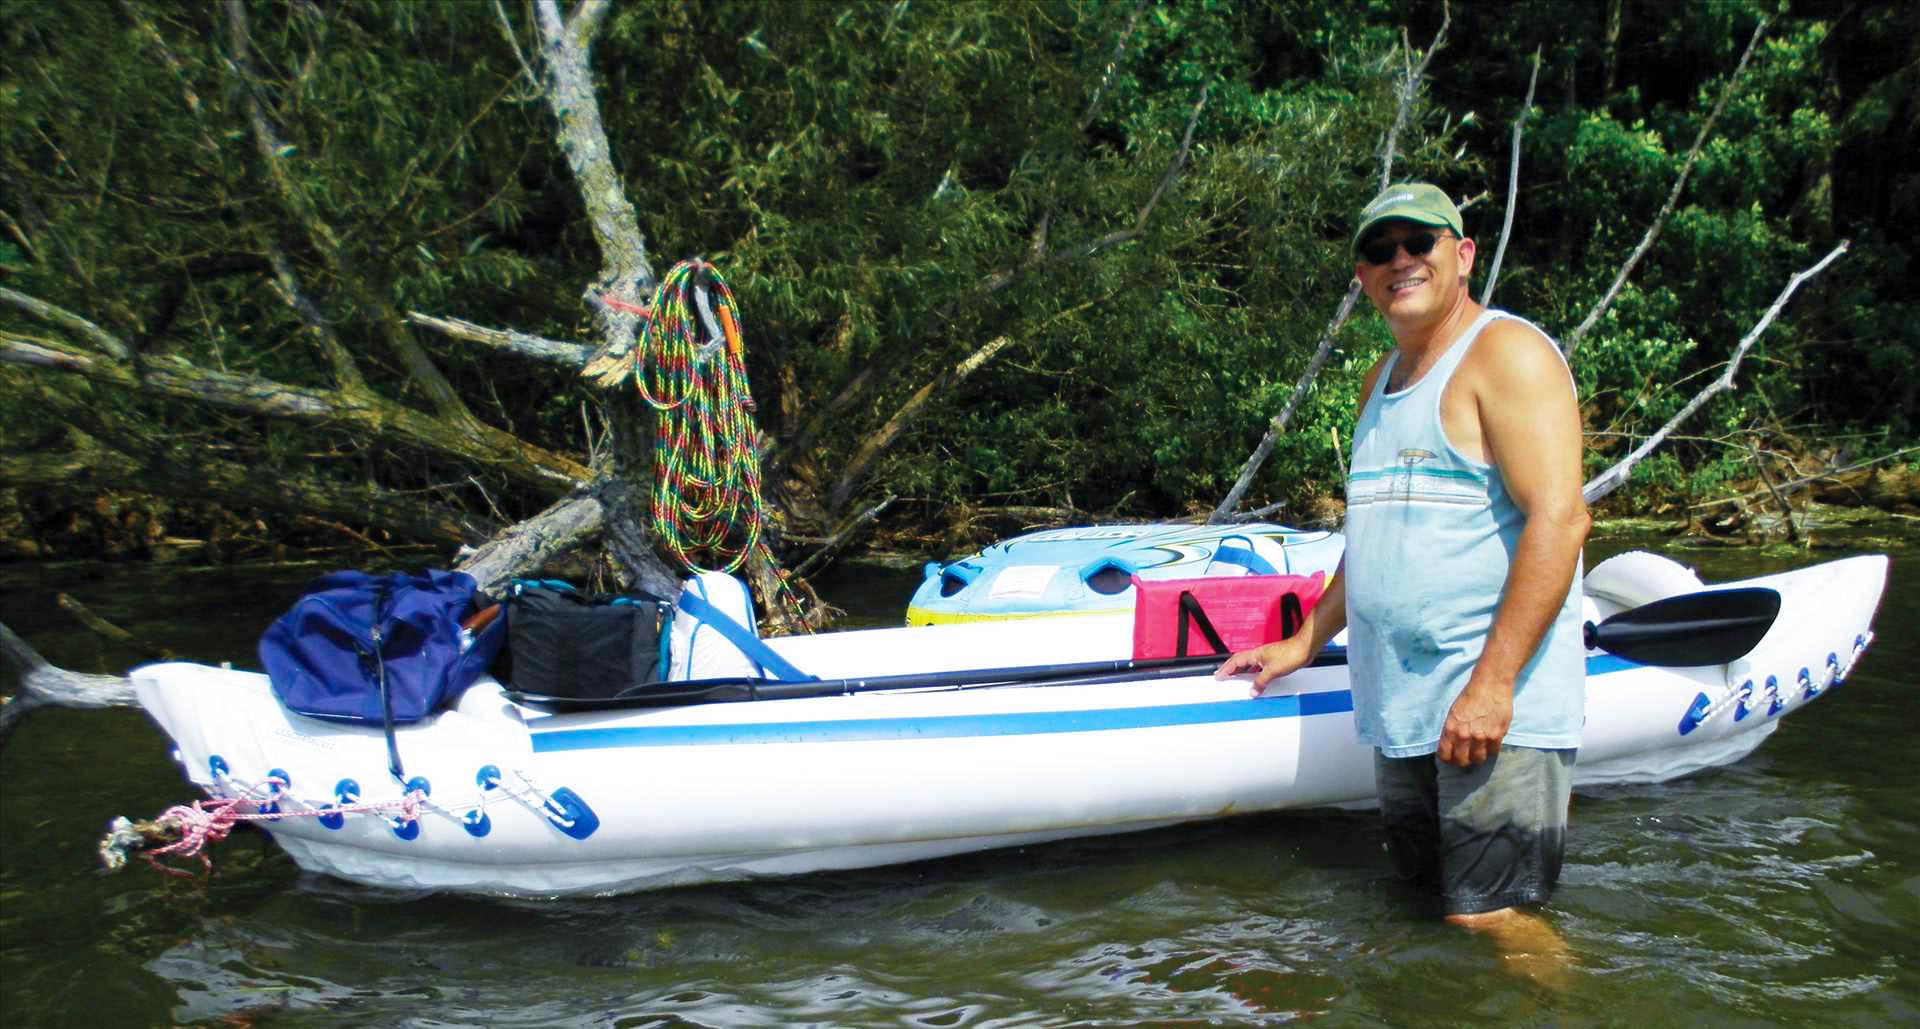 sea eagle 370 inflatable kayak capacity